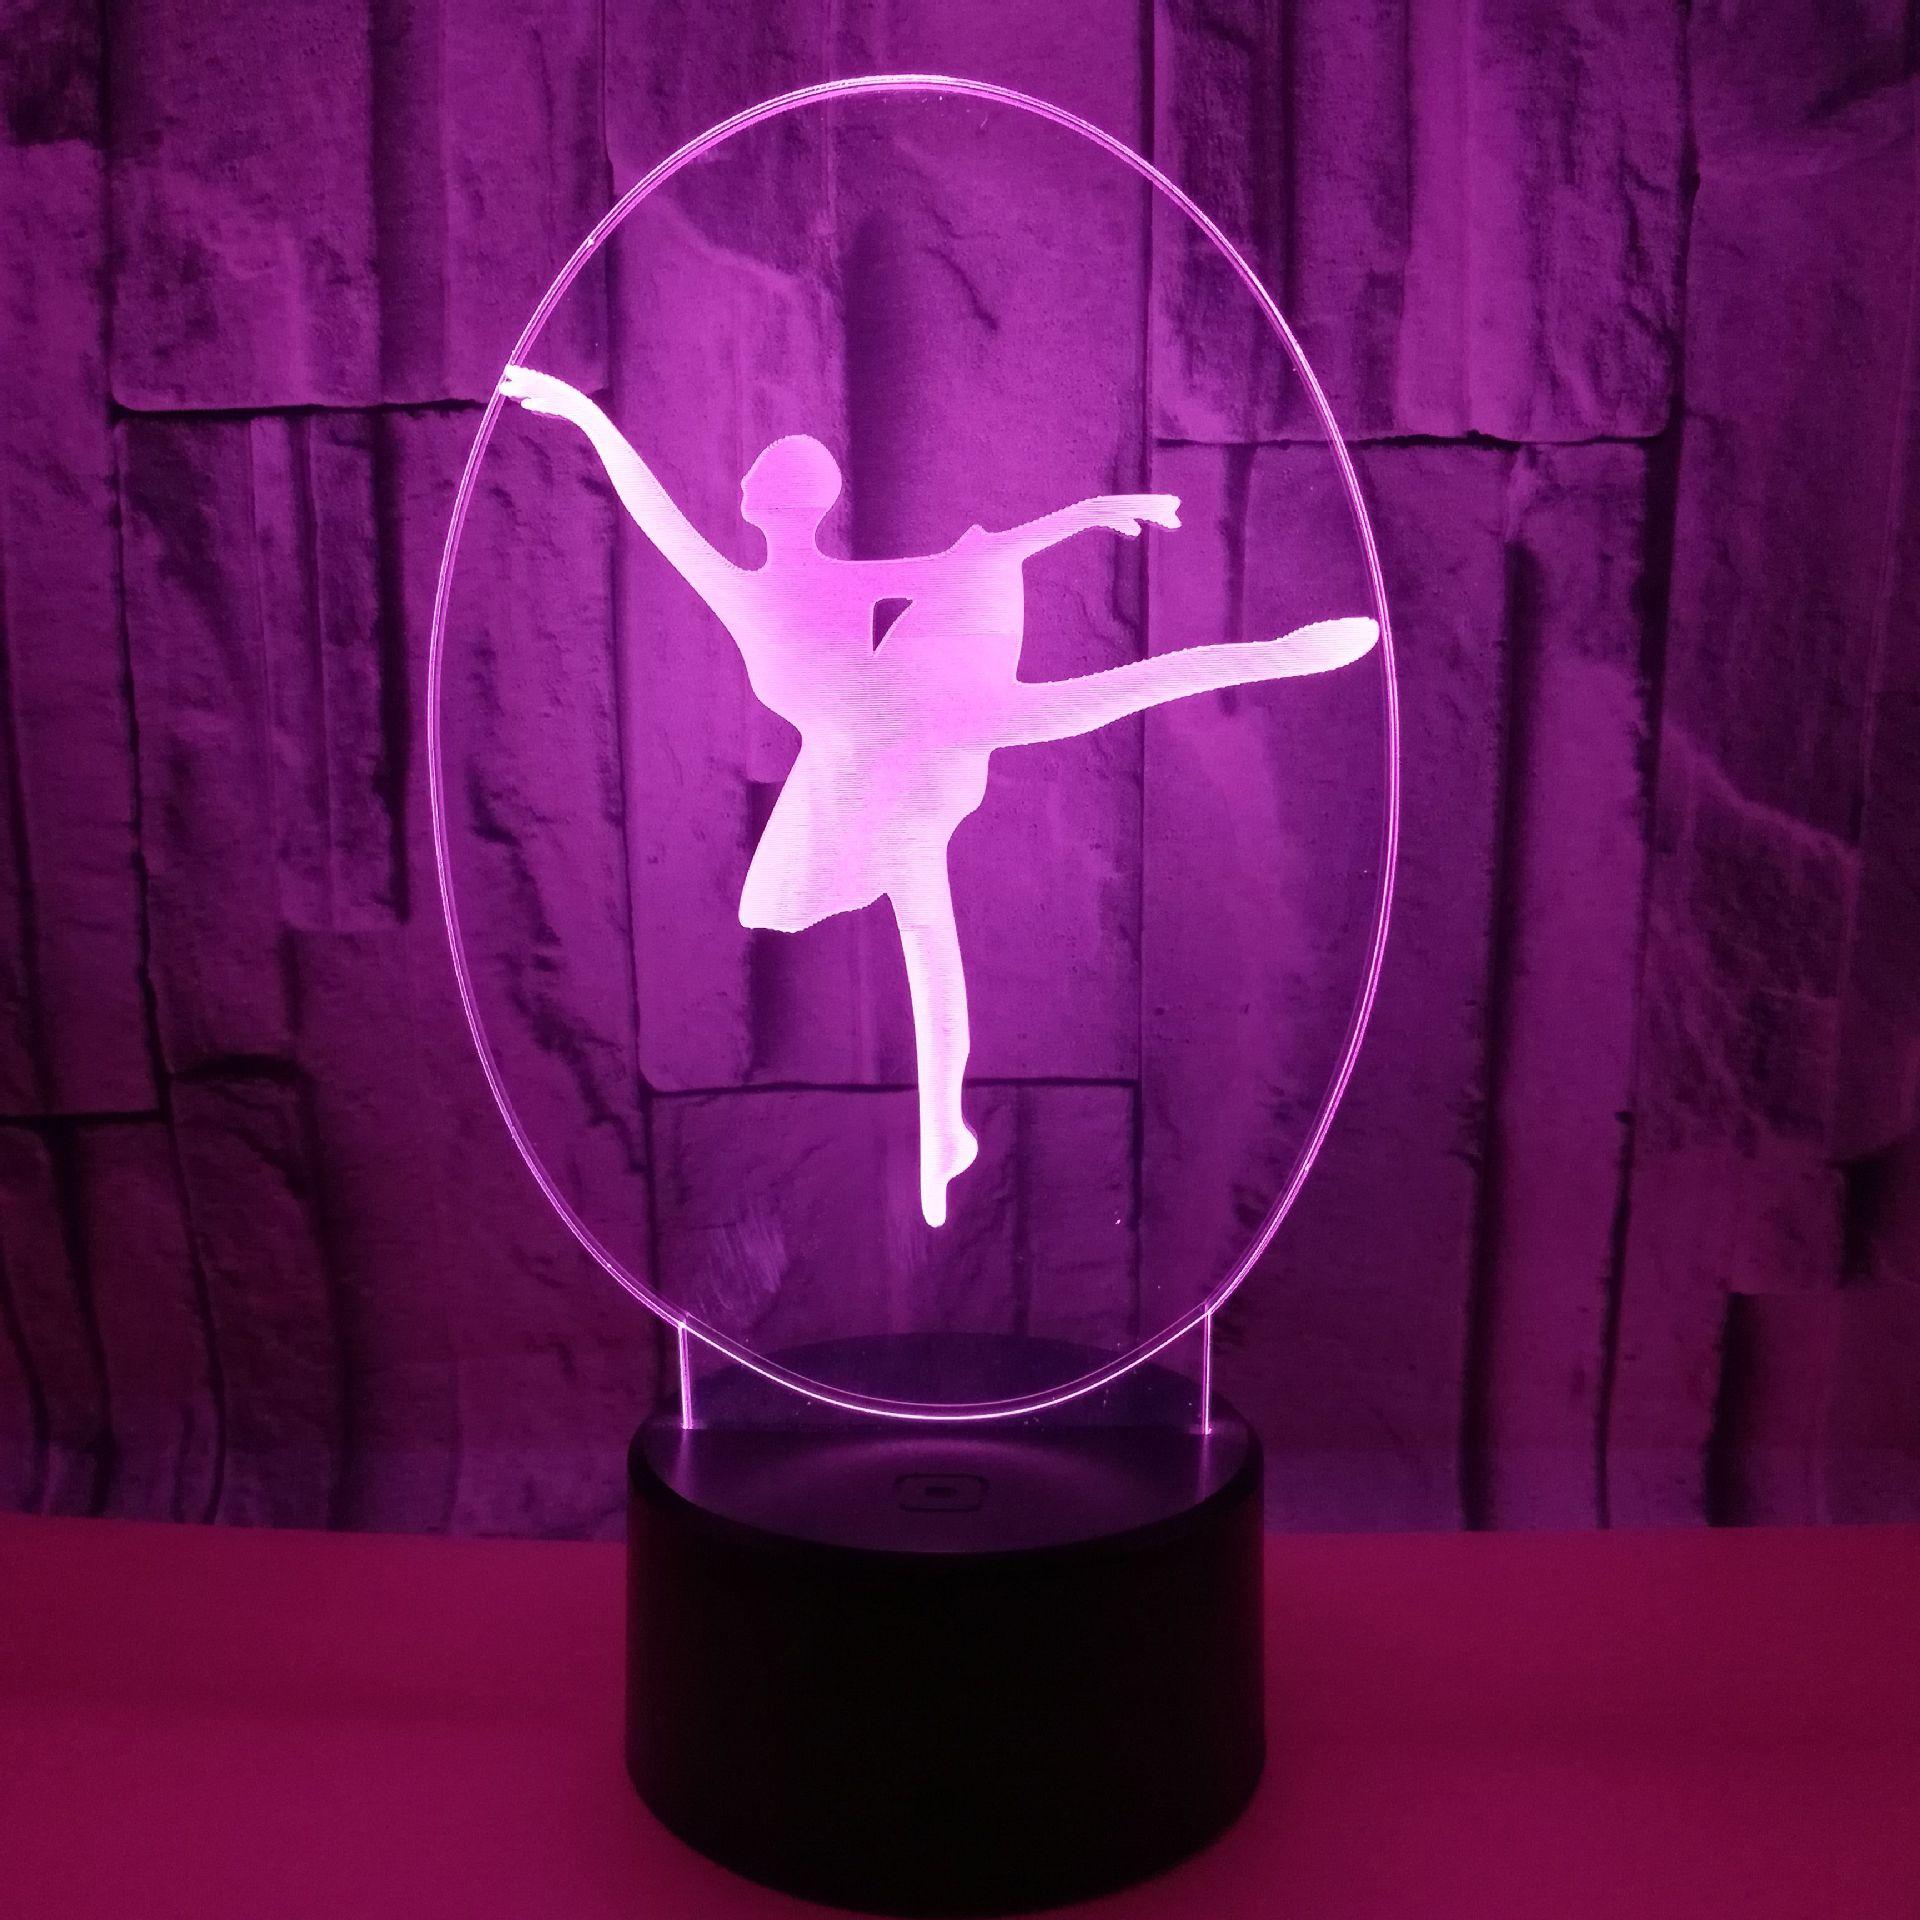 Regalos creativos calientes Ballet 3d pequeñas lámparas de mesa para sala de estar colorido Usb 3d pequeña lectura noche lámpara de escritorio Luz